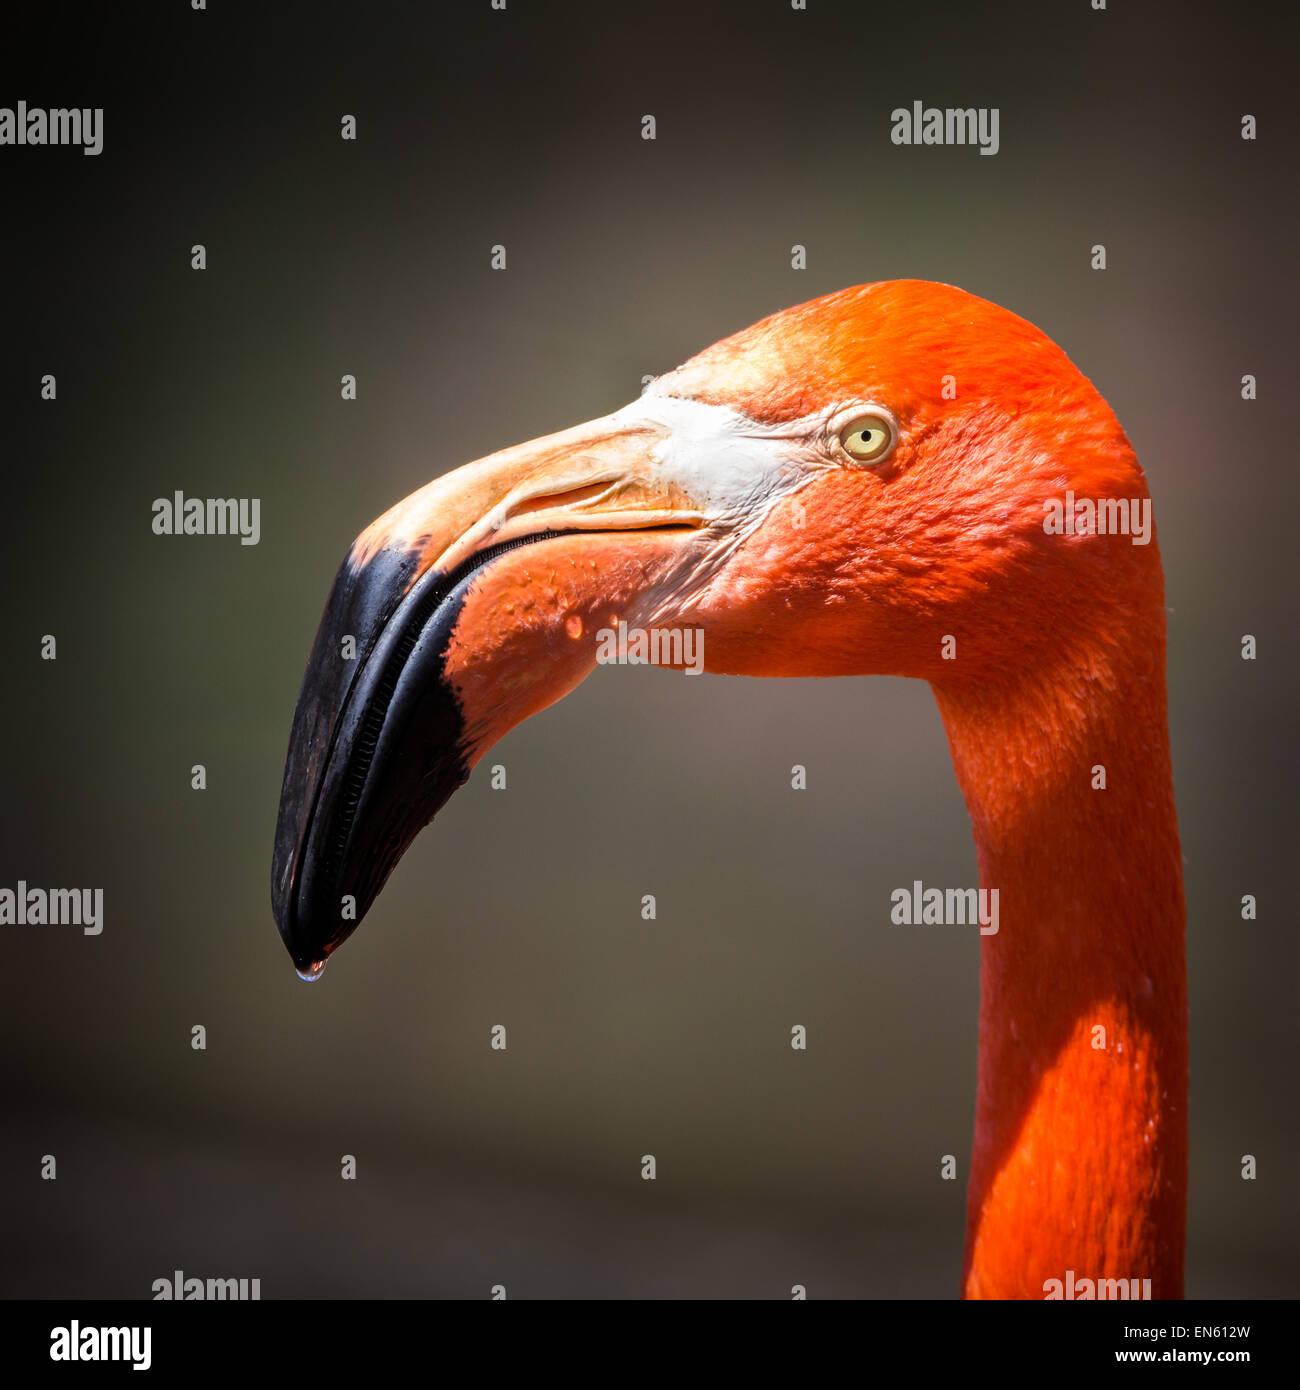 Amerikanische Flamingo Profilbildnis Stockbild